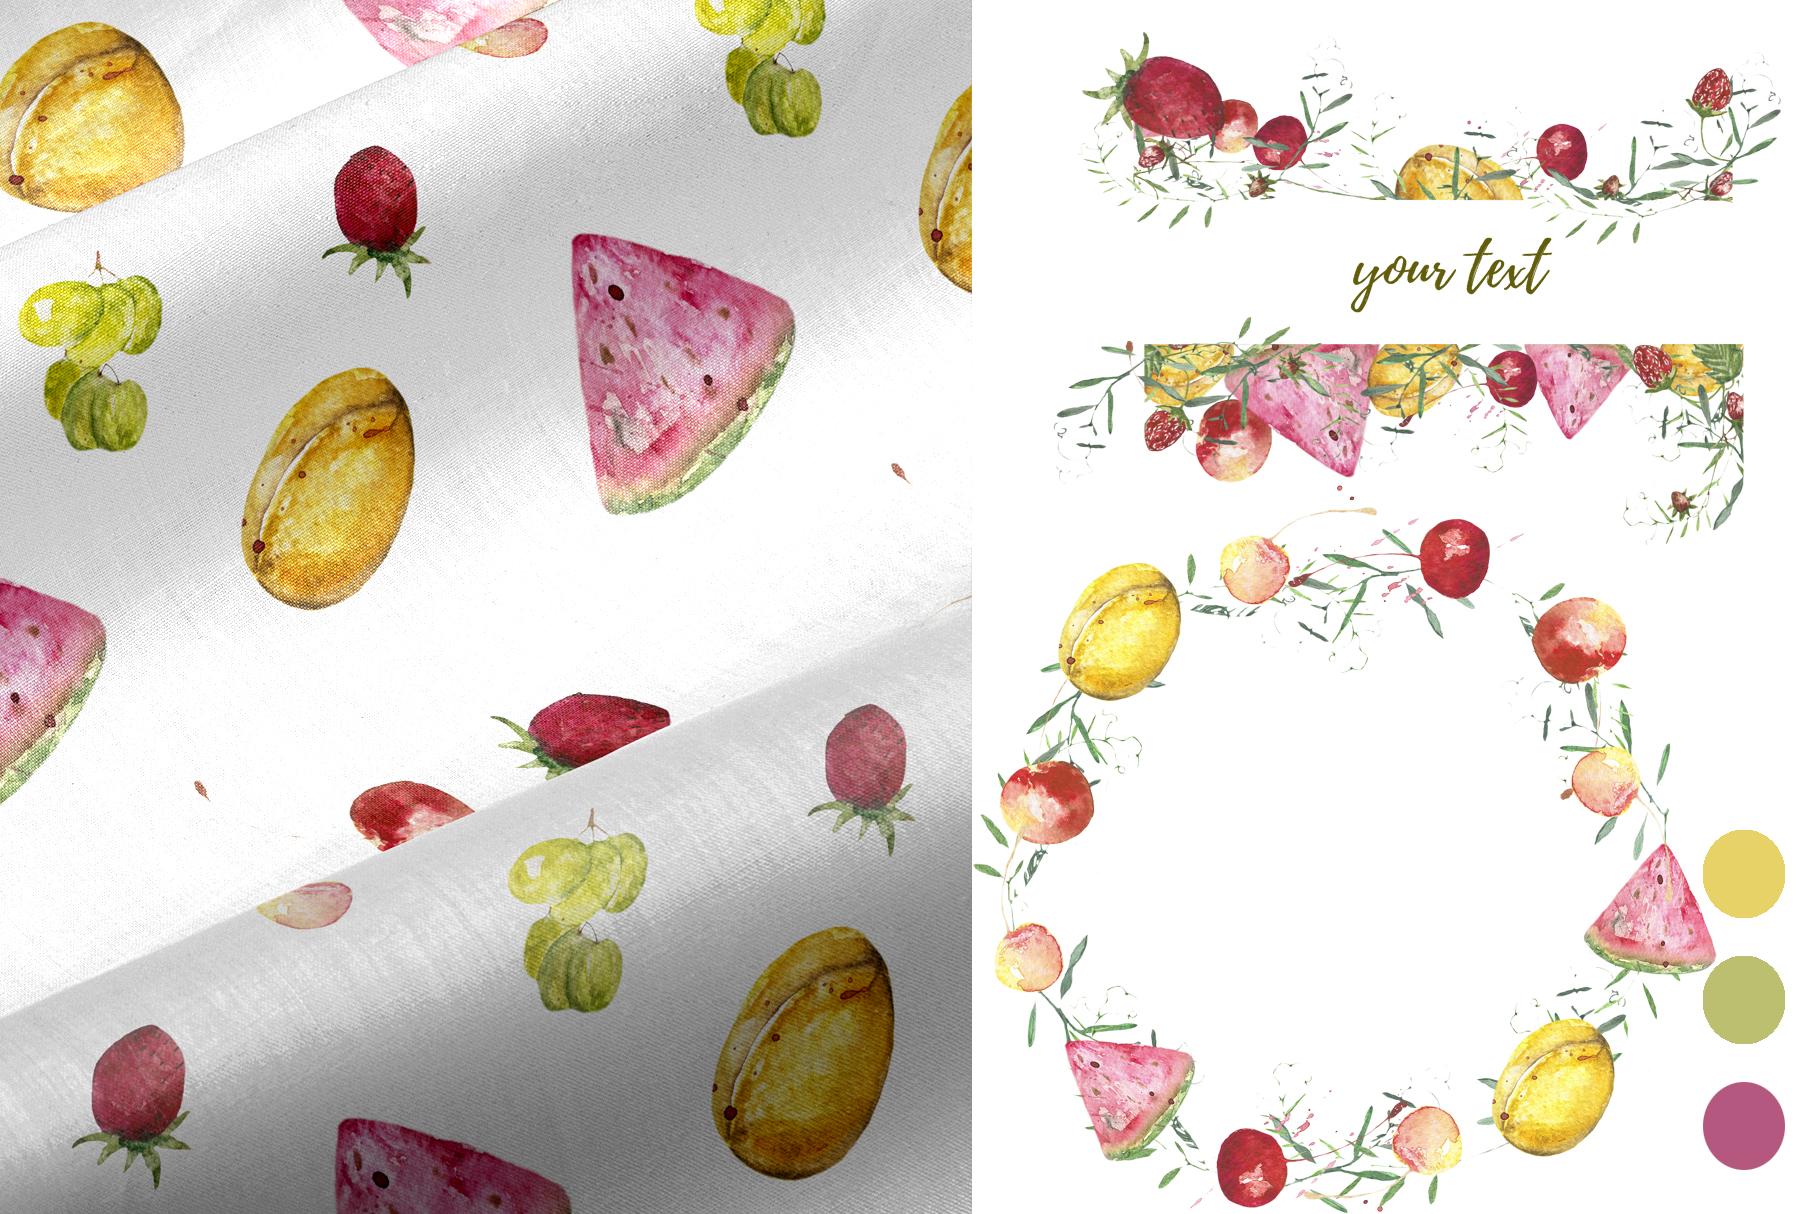 Fruit vegetables food watercolor example image 5